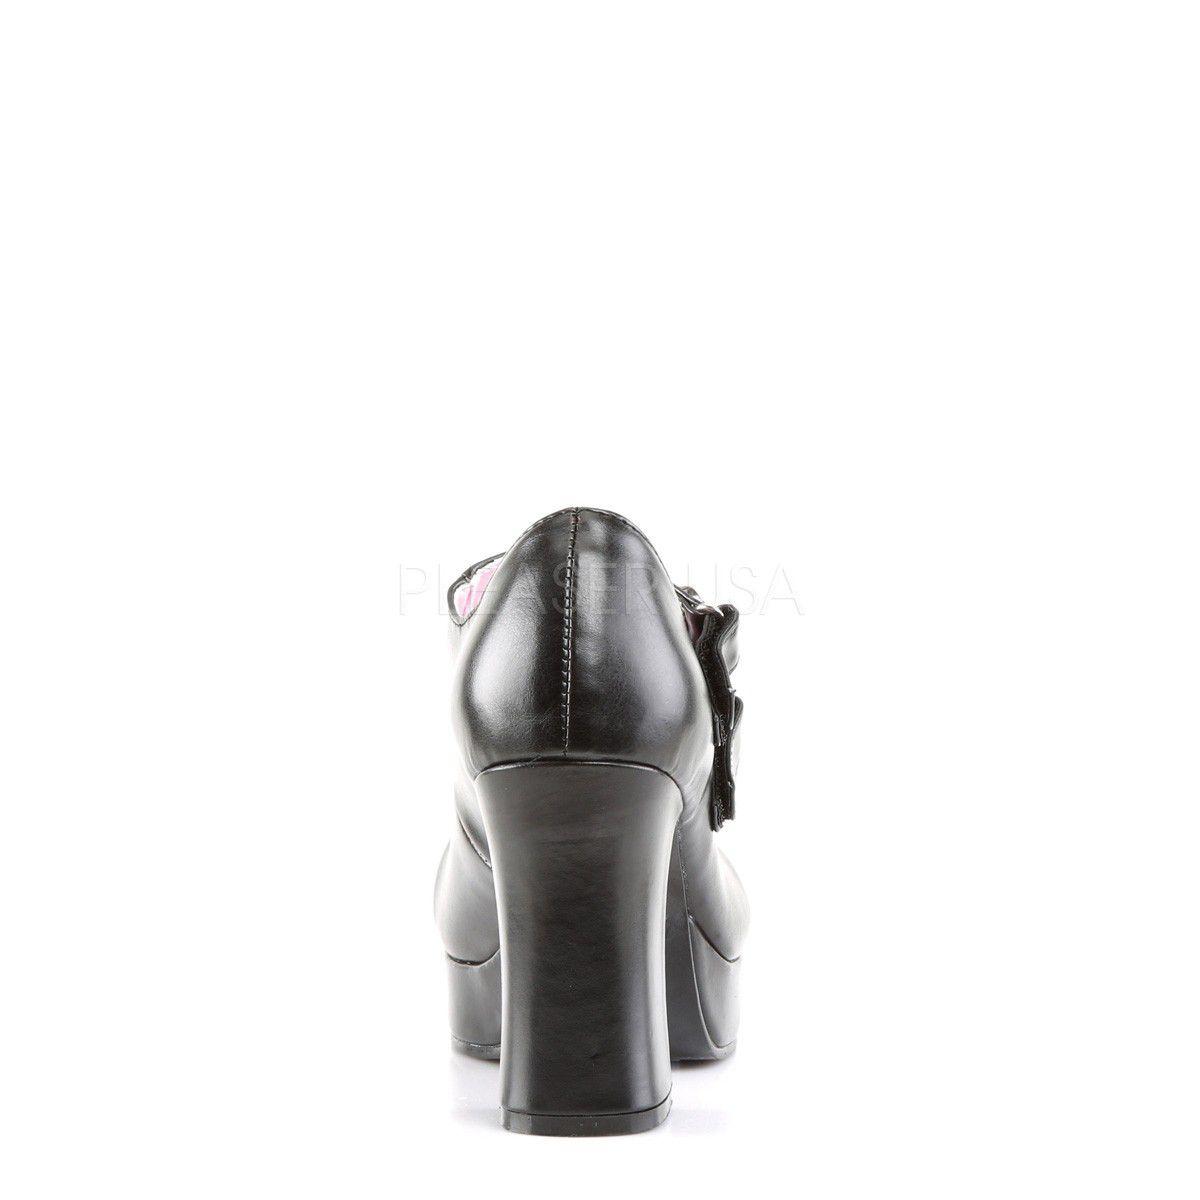 Sapato Gothika 09 - Demonia (encomenda)